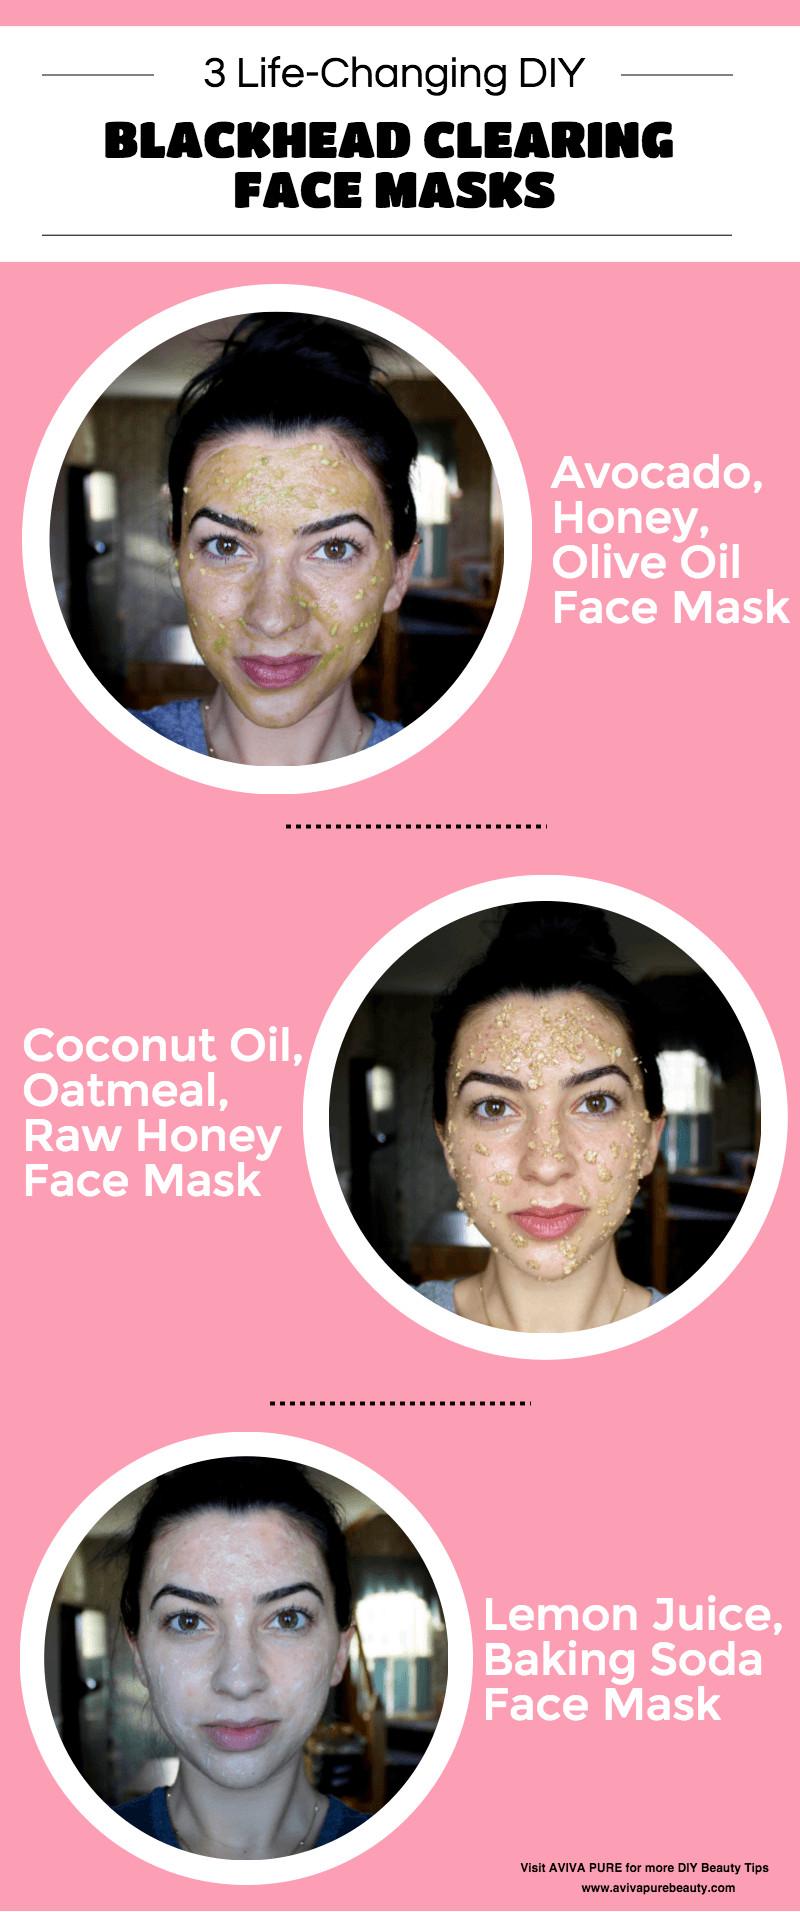 DIY Face Masks For Blackheads  DIY Face Masks for Blackheads